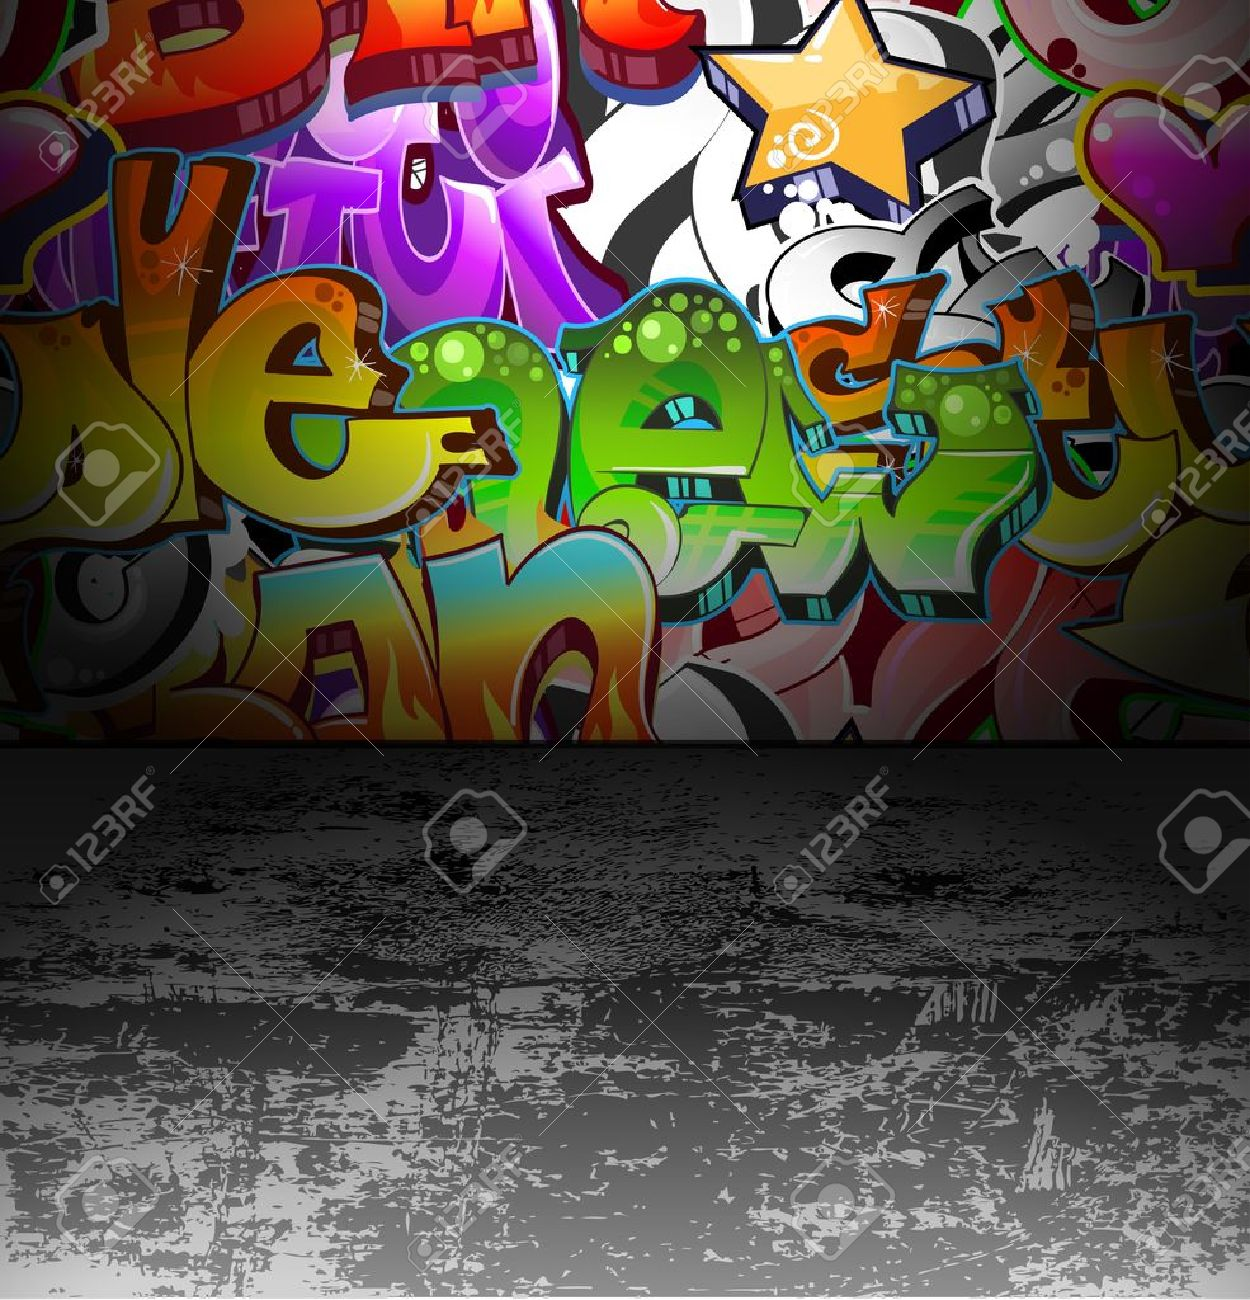 Graffiti wall vector free - Graffiti Wall Urban Background Stock Vector 12486236